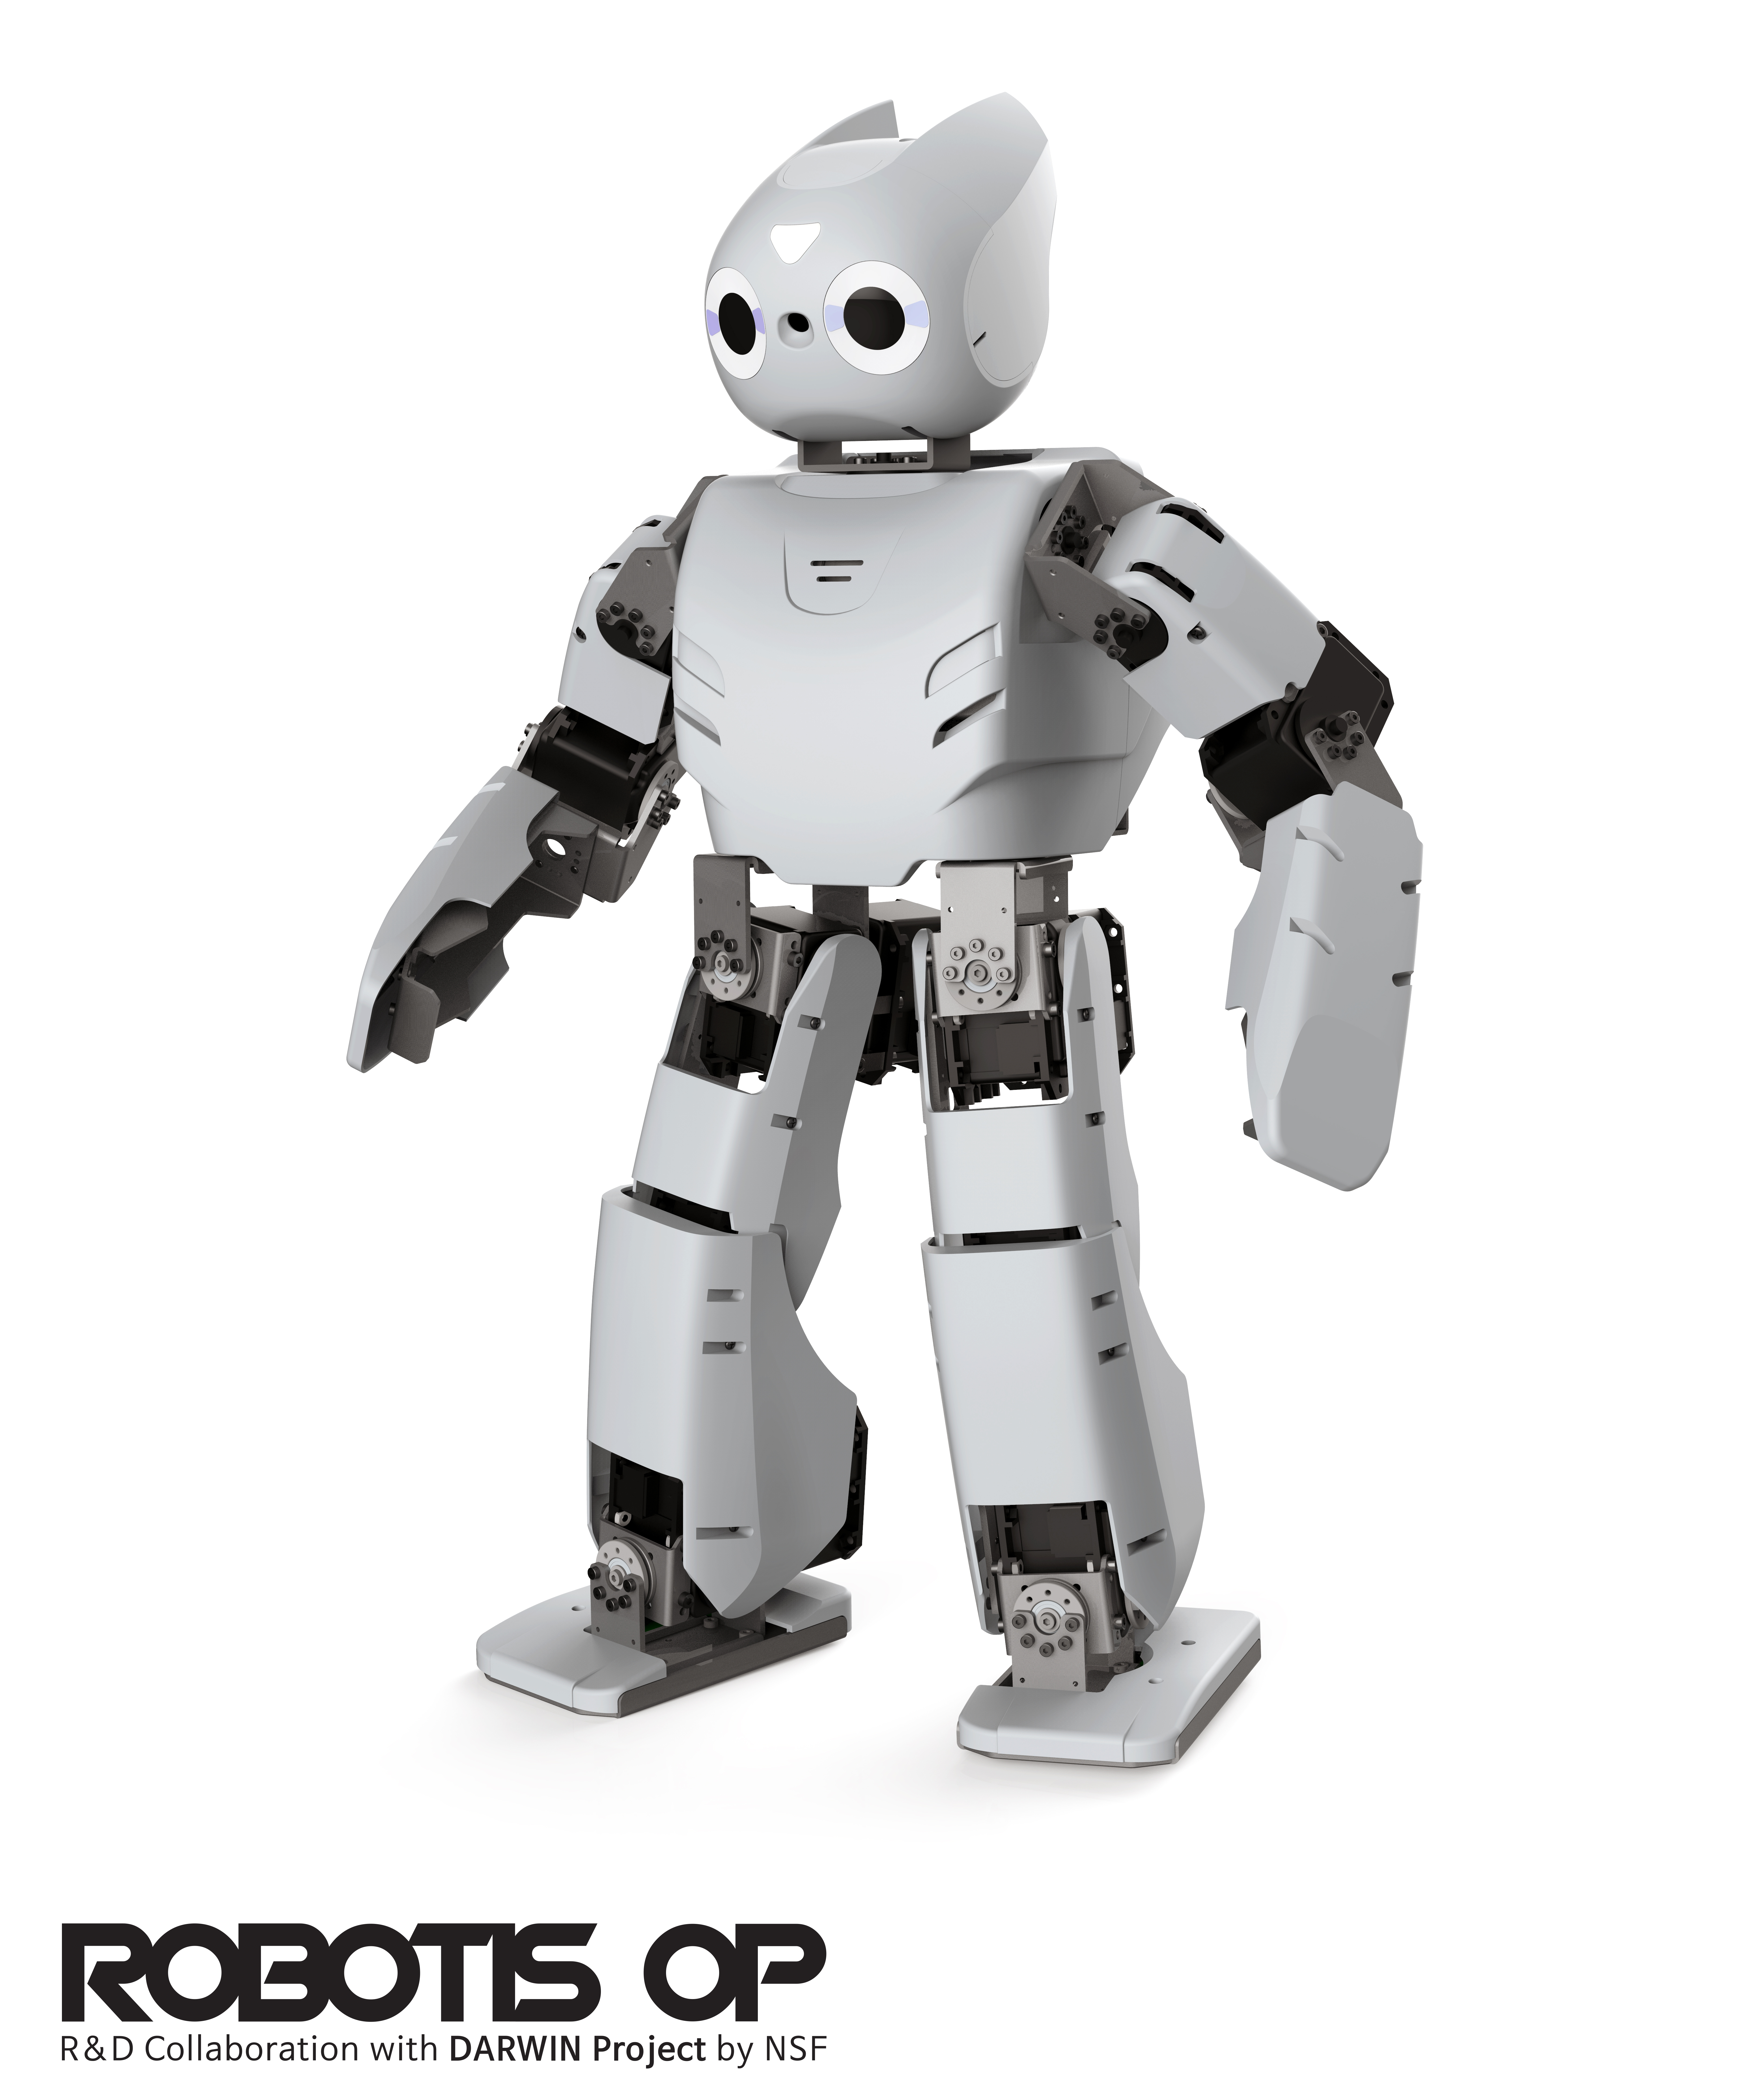 robotis-op2.jpg